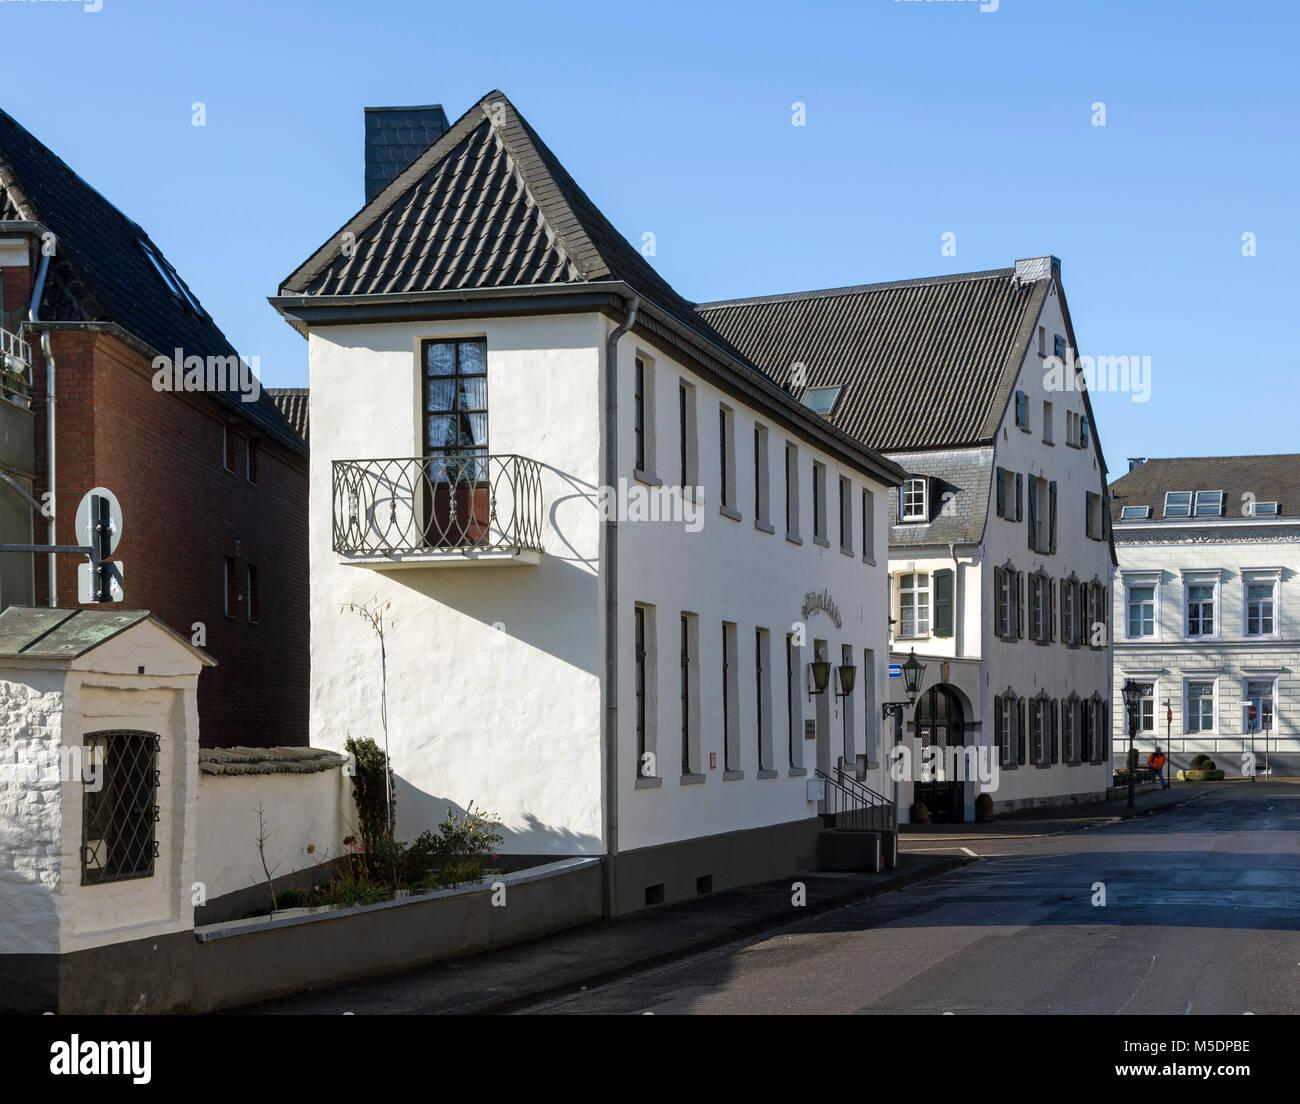 "Krefeld-Uerdingen, Haus ""Bügeleisen"" am Zollhof, hinten Haus Neuhofs, Gebäudeensemble am Zollhof, 1778 erbaut Stock Photo"